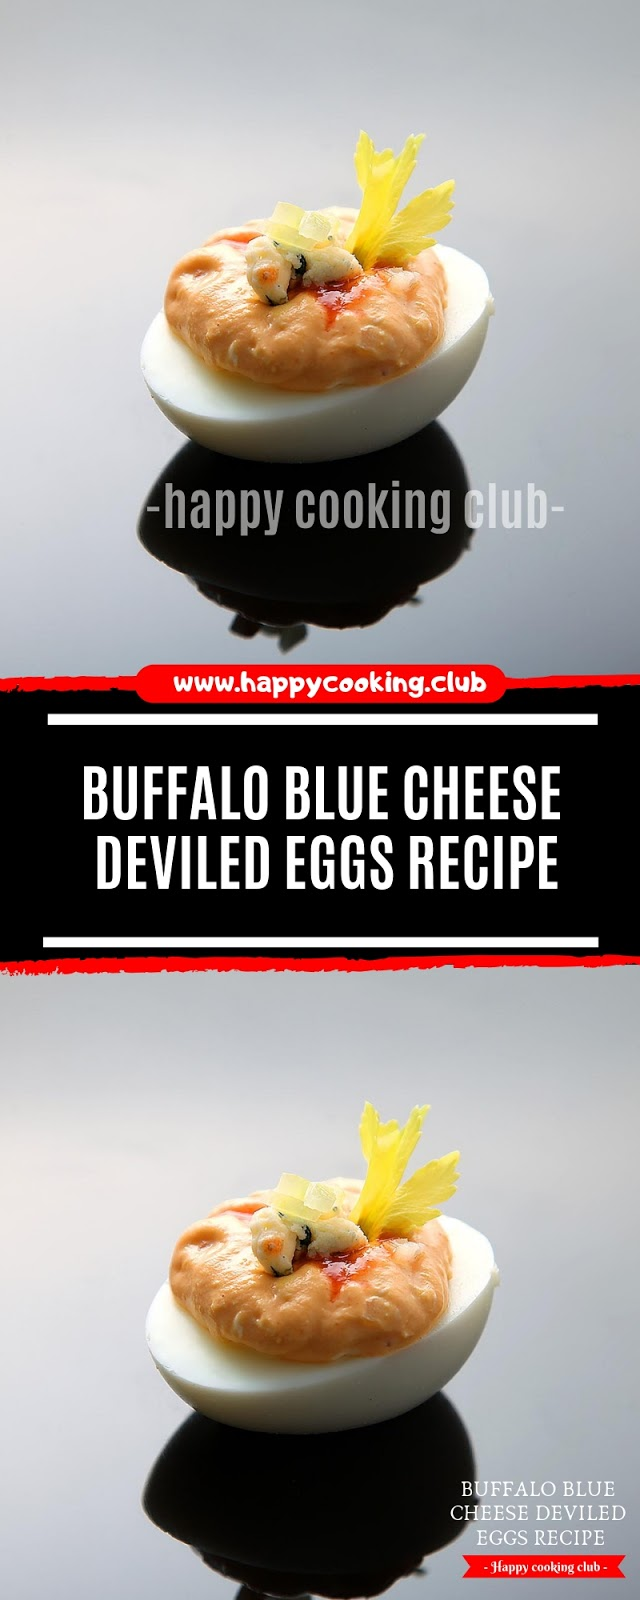 Buffalo Blue Cheese Deviled Eggs Recipe